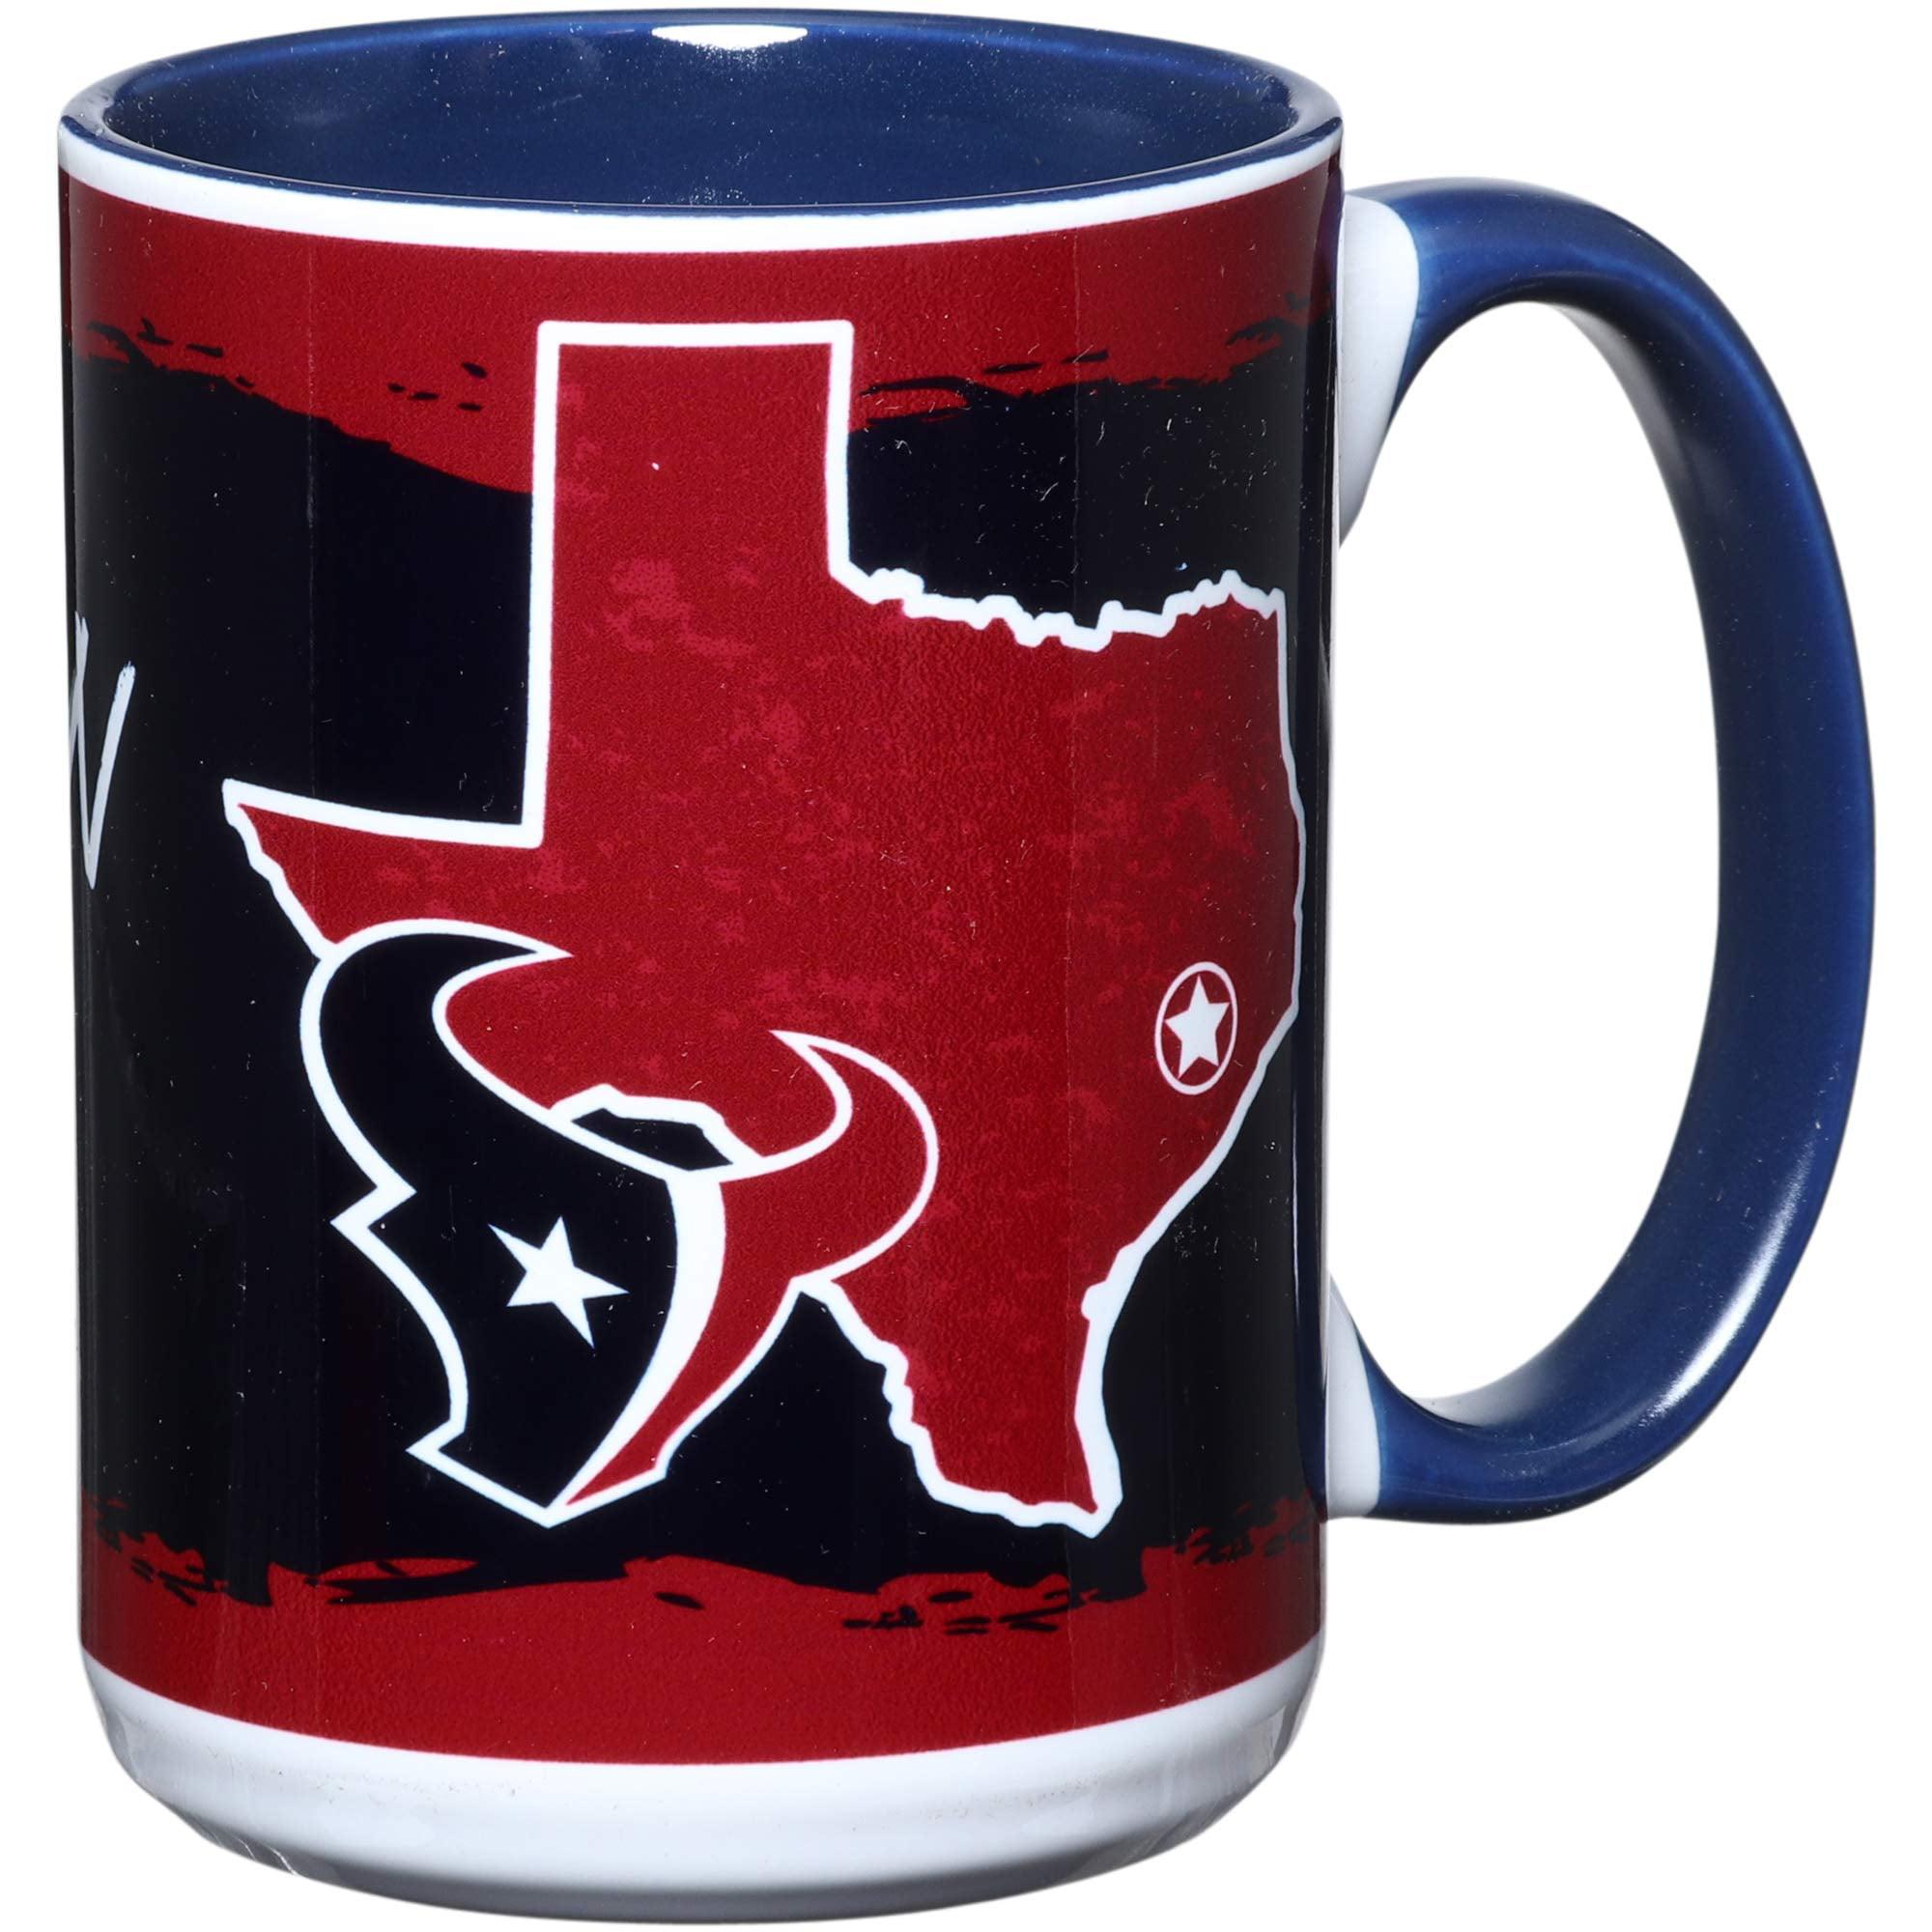 Houston Texans 15oz. It's Your State Of Mind Mug - No Size